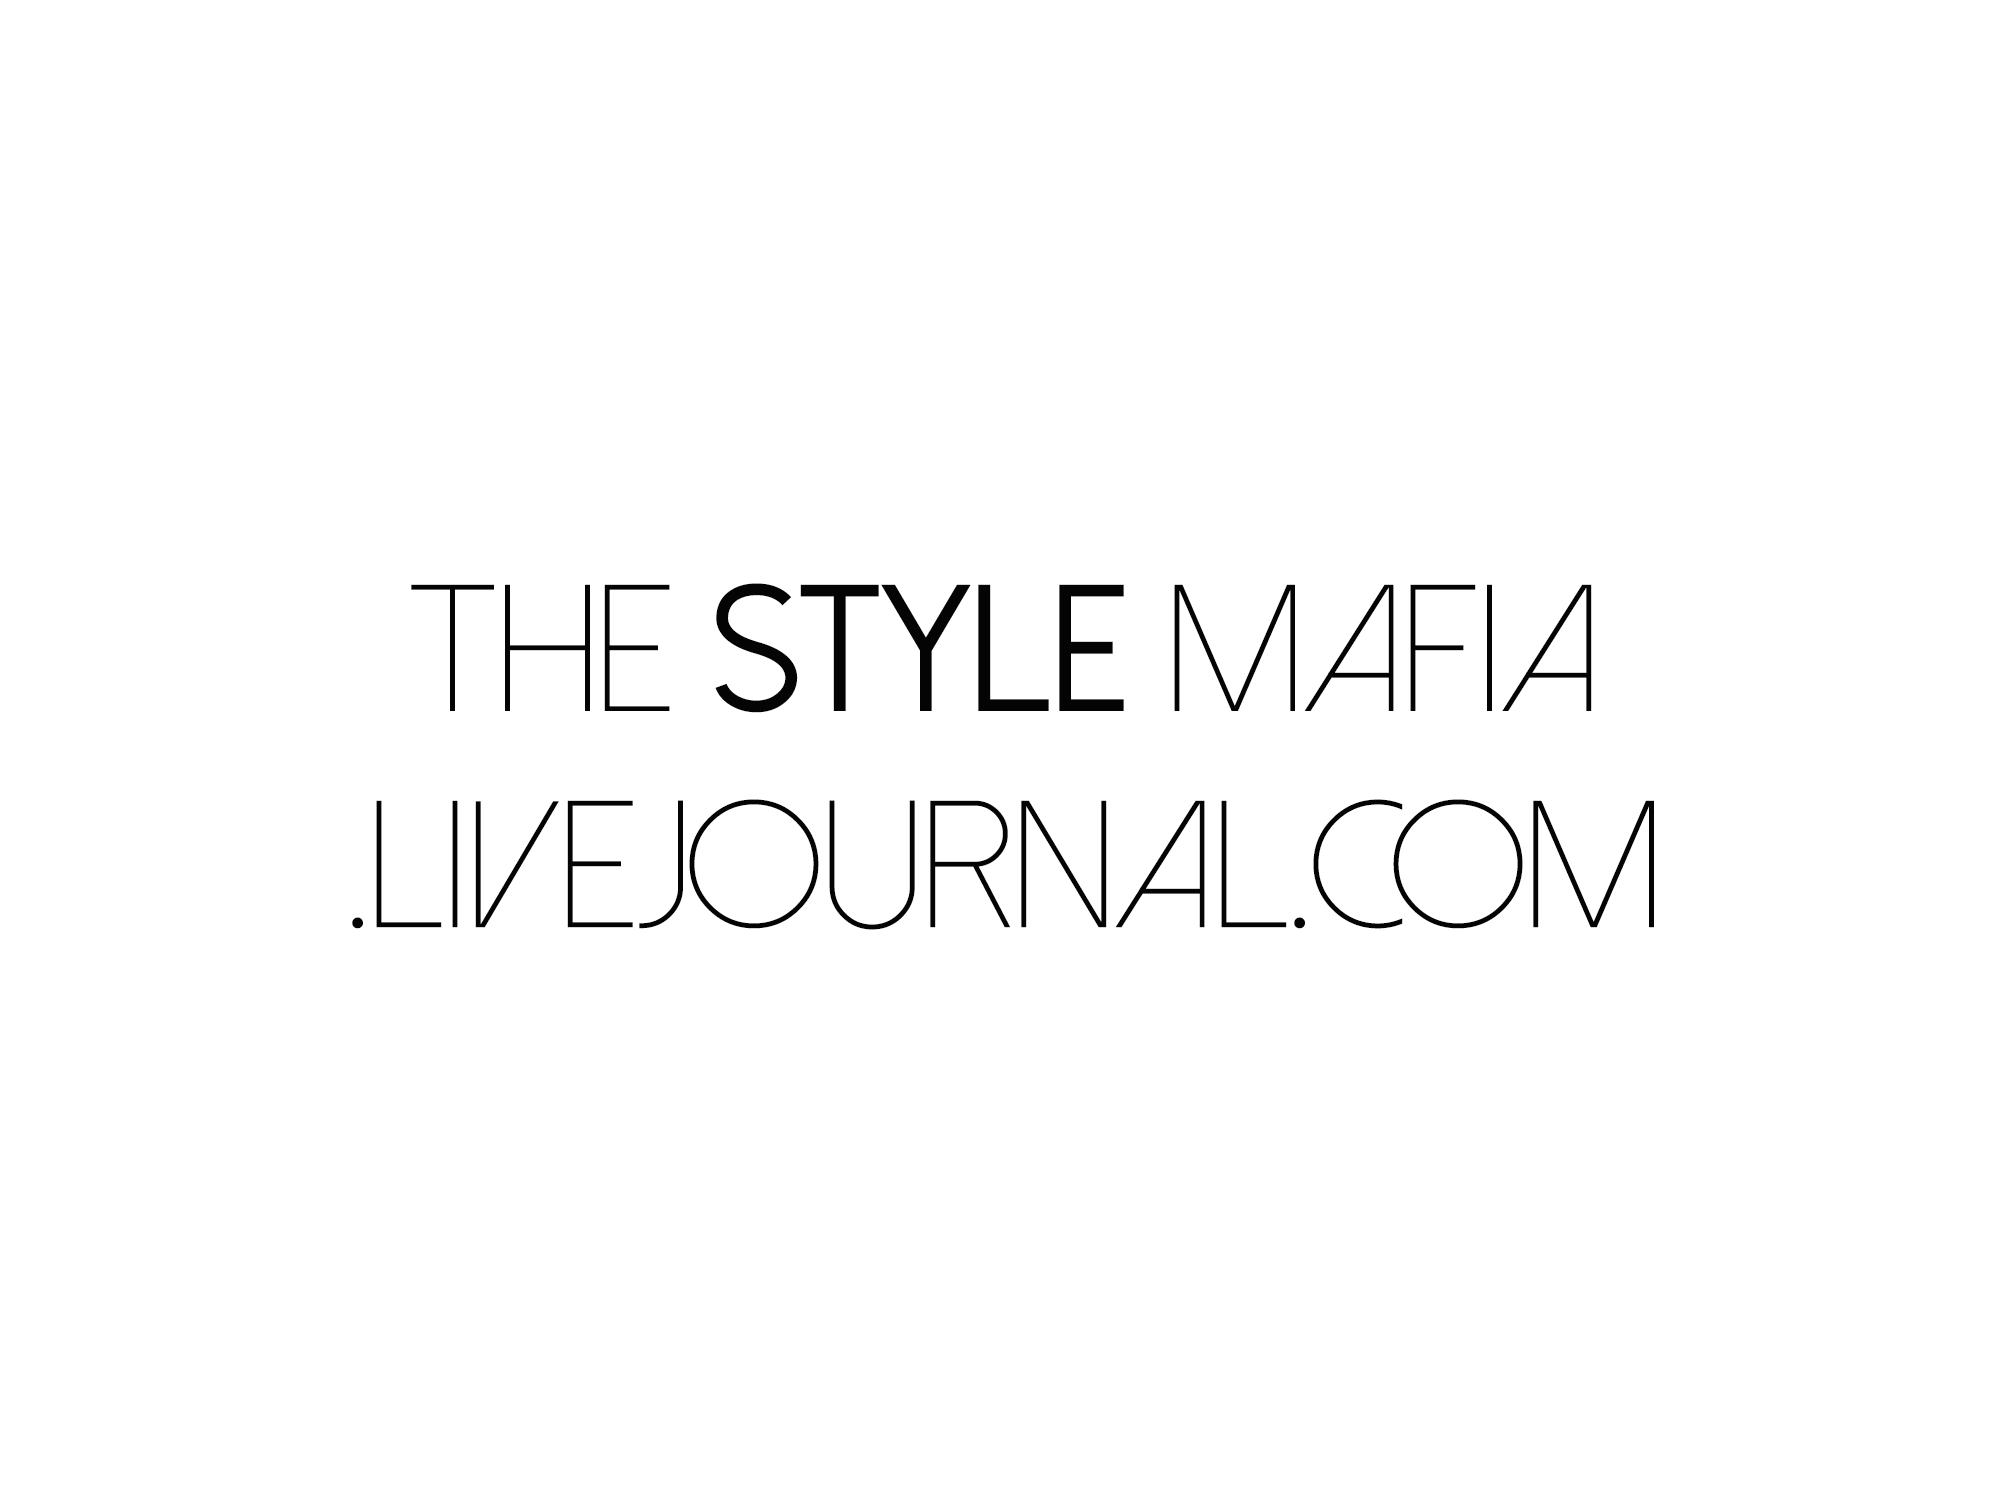 Style Mafia (Clothing and Fashion)